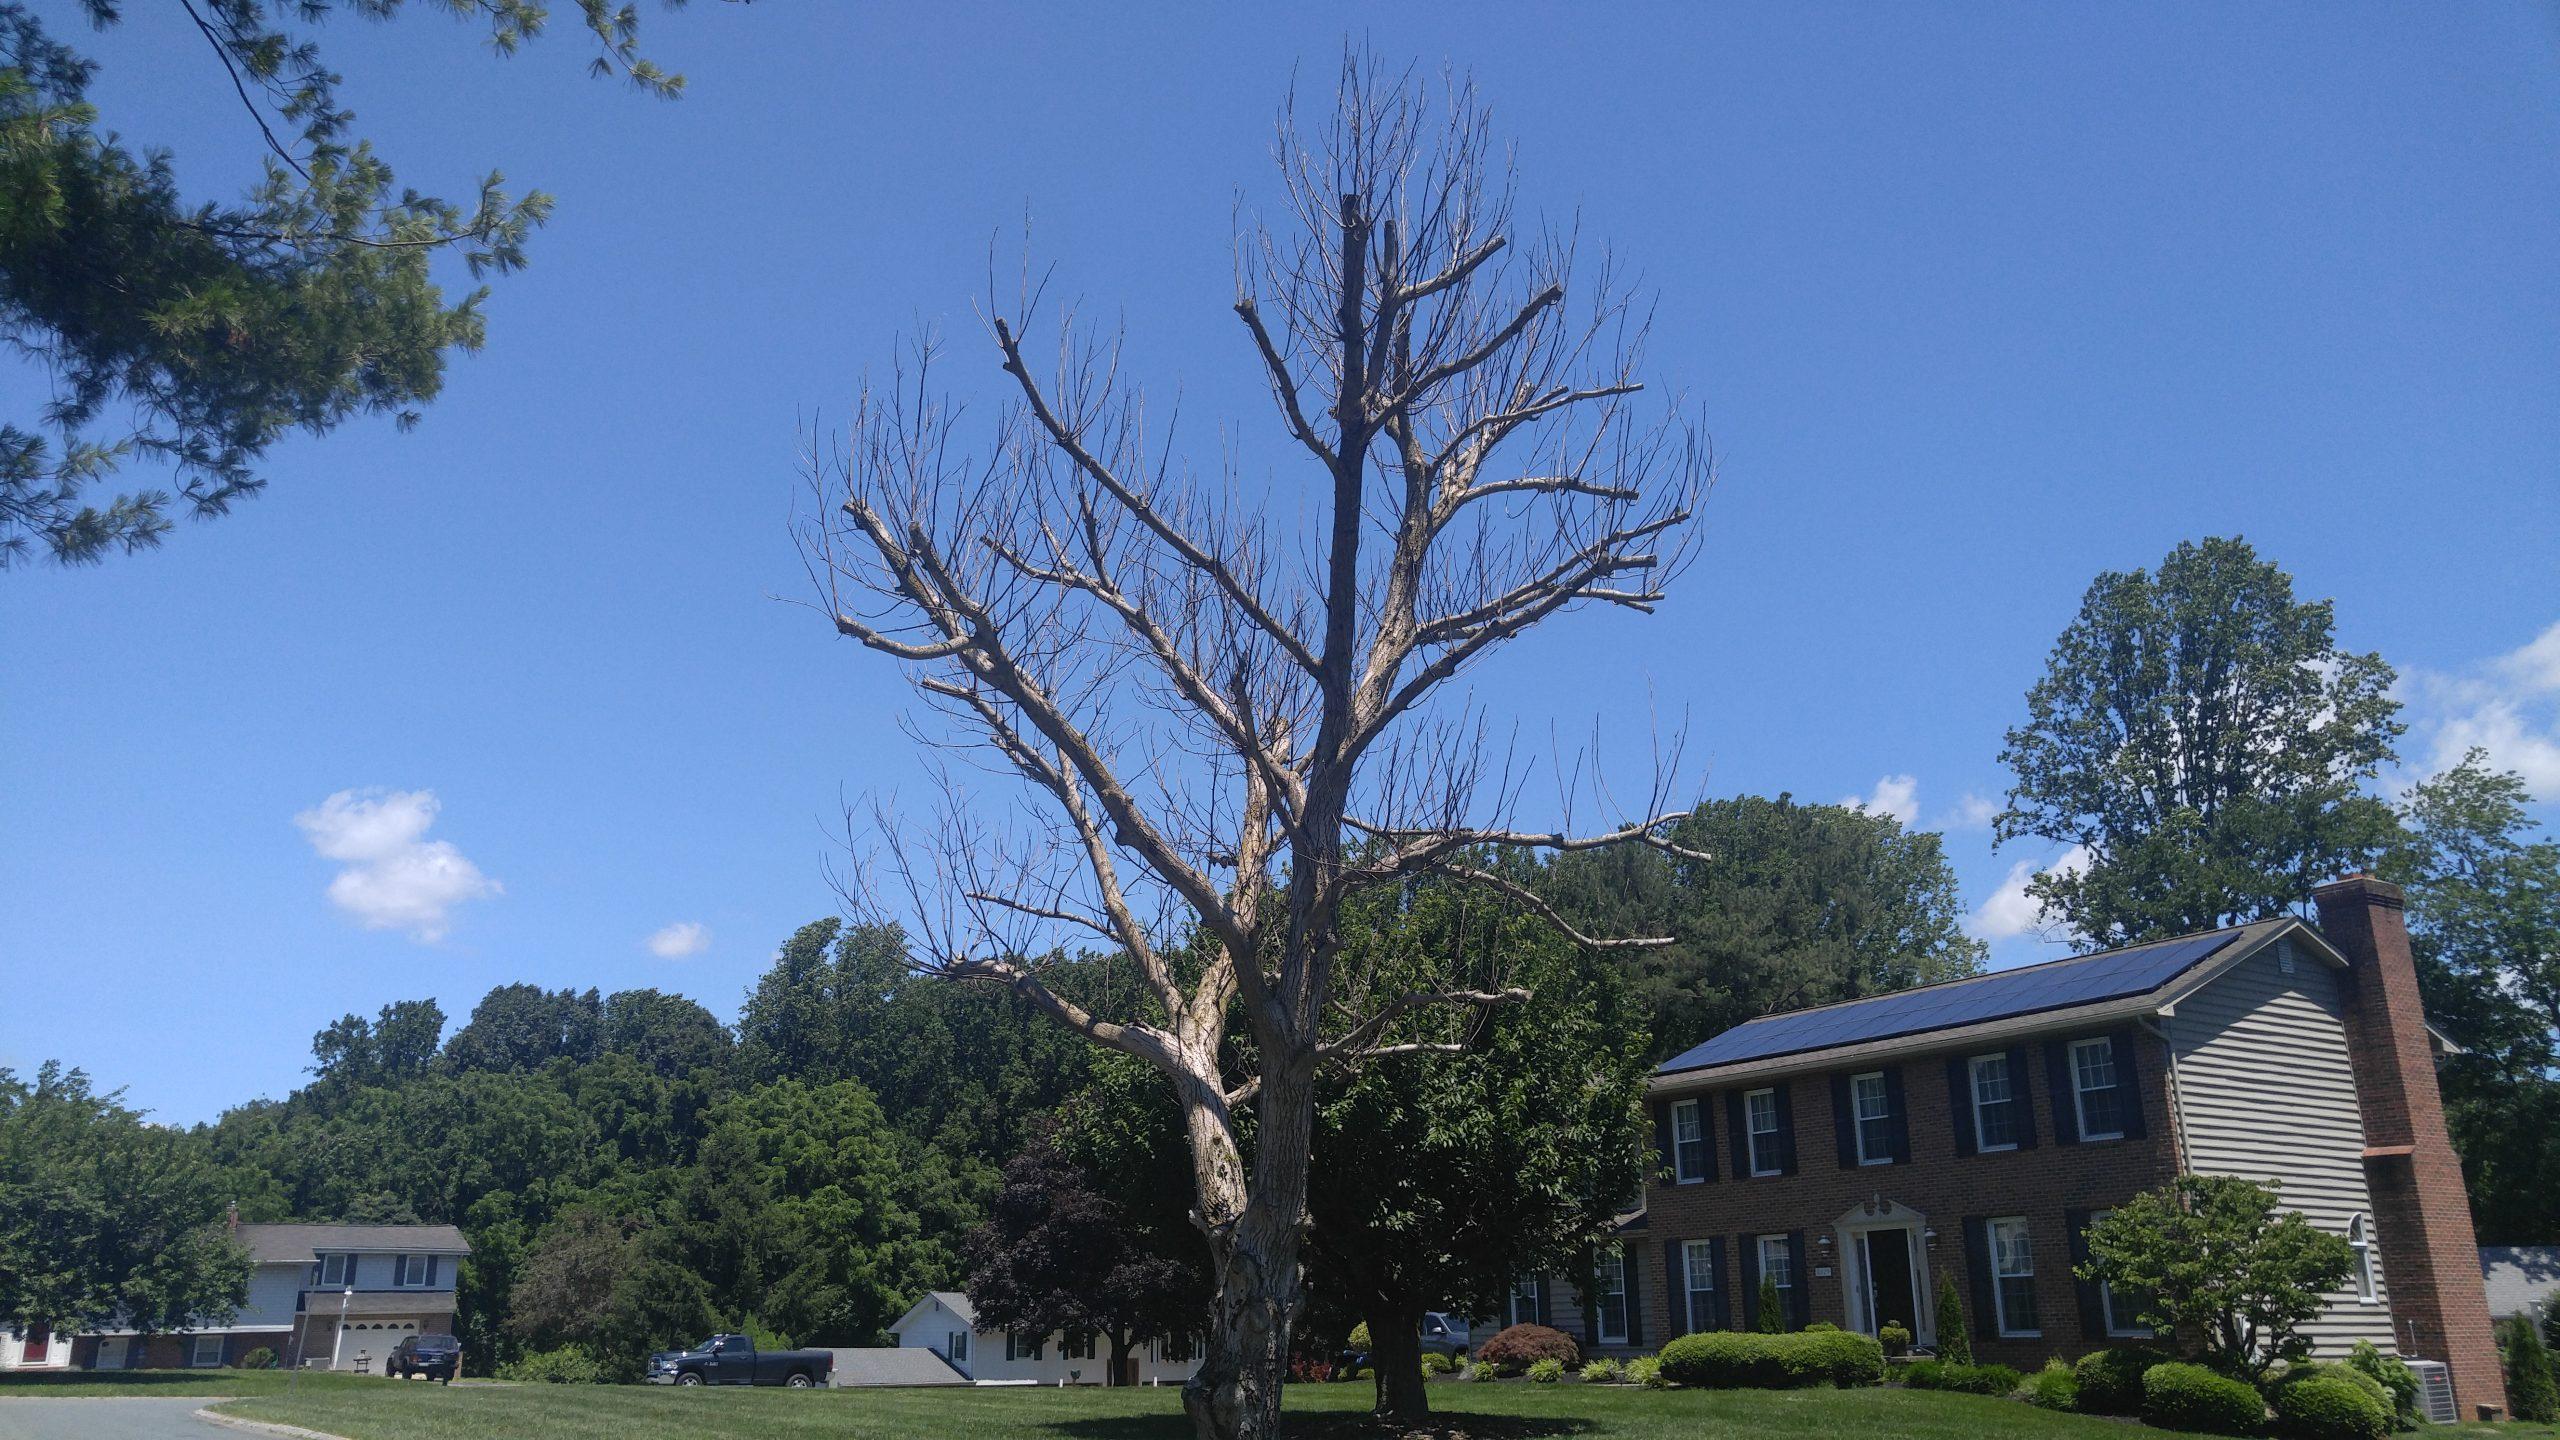 Tree Topped in Glen Arm, MD